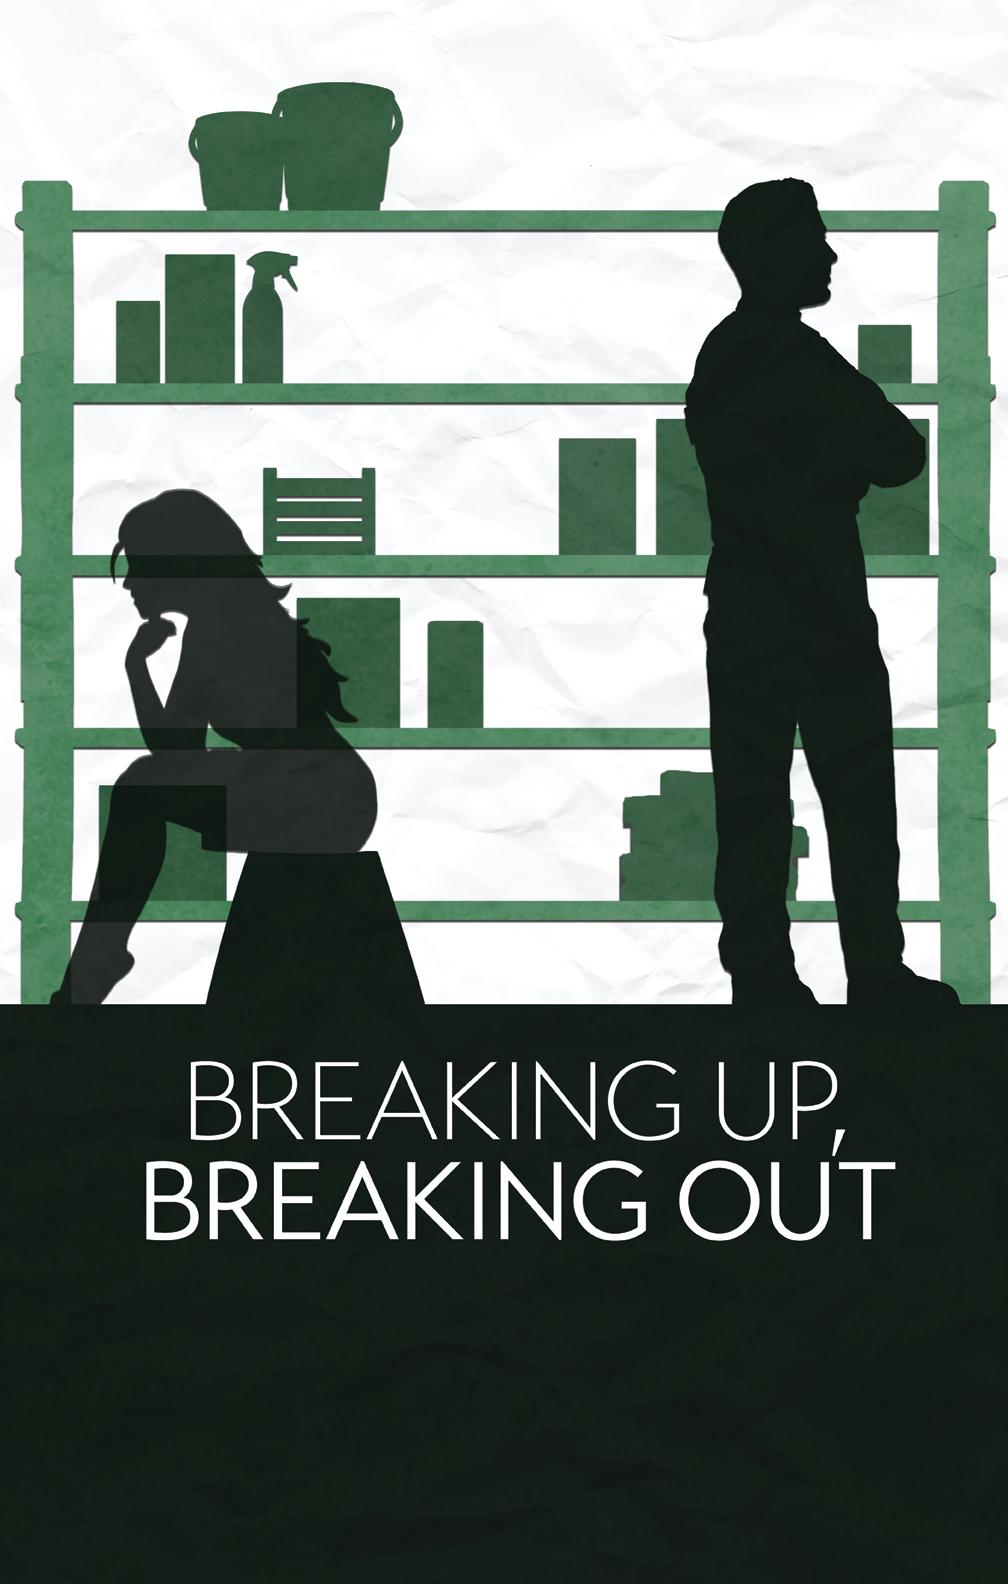 BreakingUpBreakingOut_72dpiRGB_1008x1584nobleed.jpg